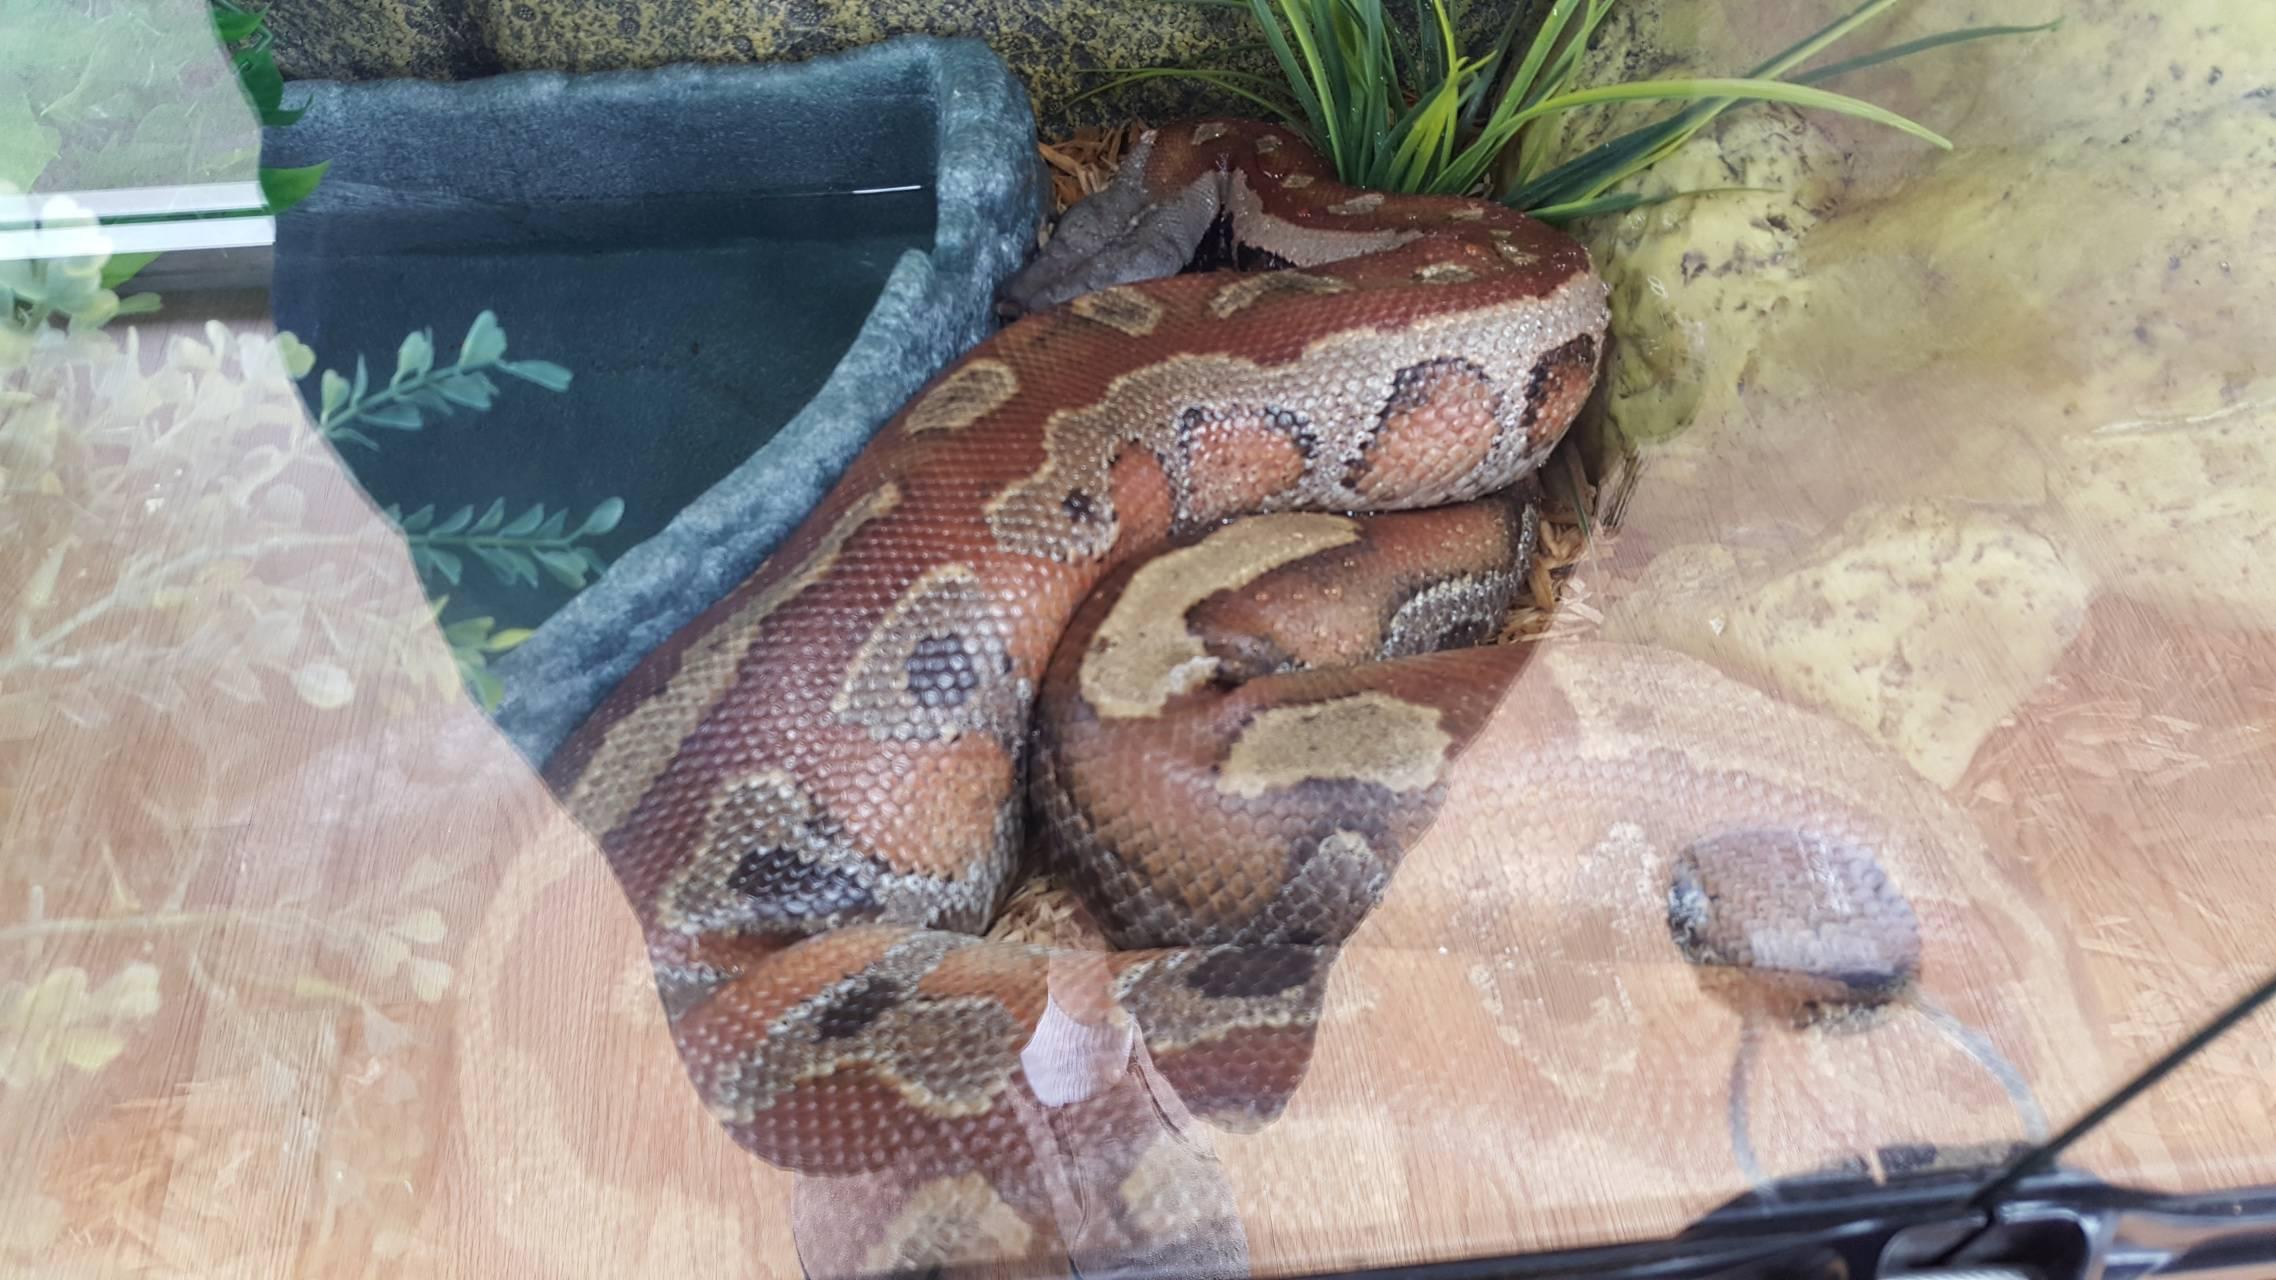 Big reptile